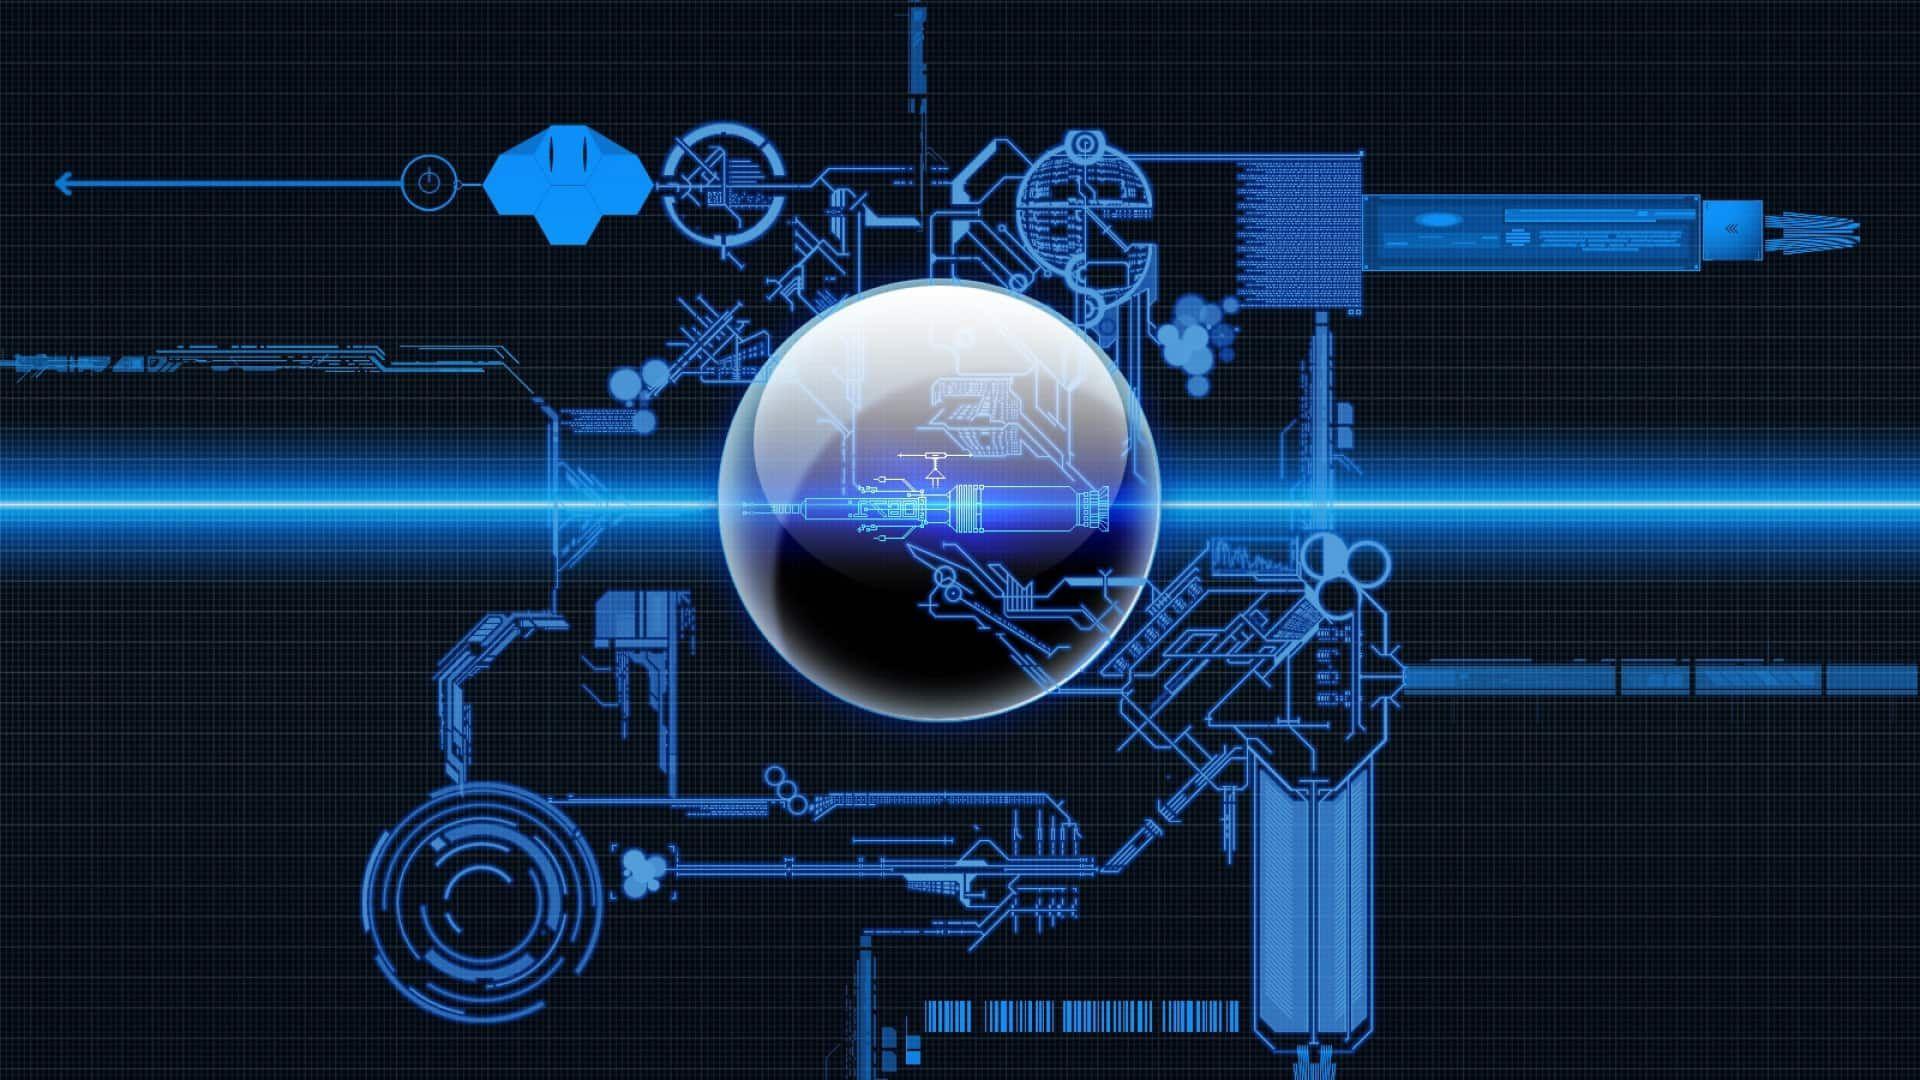 Blueprint wallpaper image